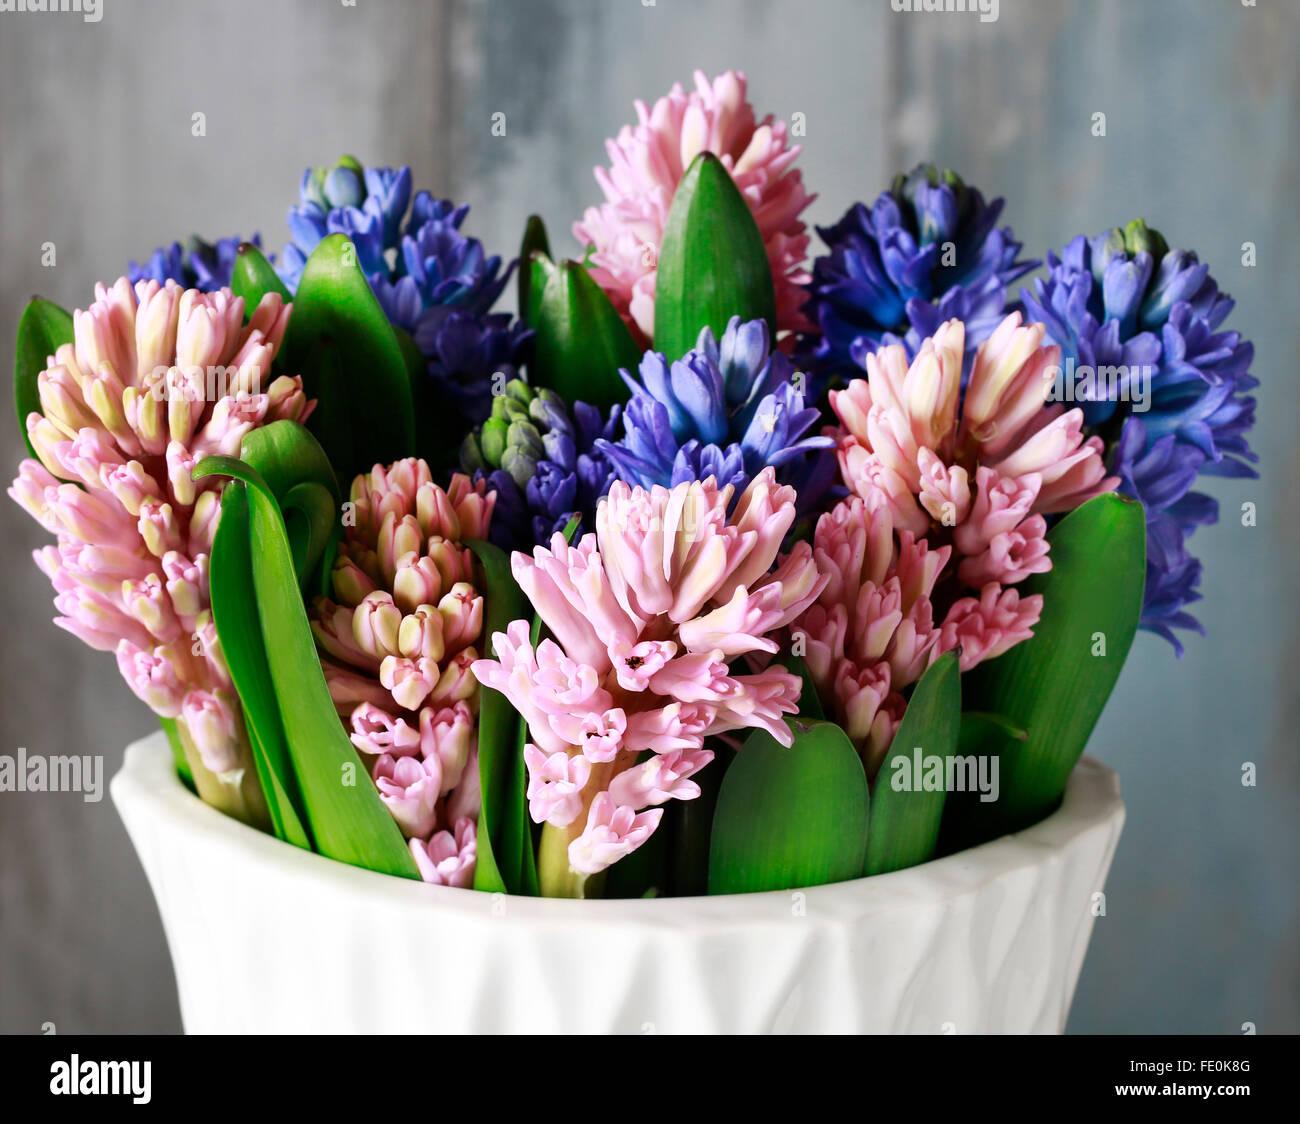 Hyacinth Bulb Flower Vase Stock Photos & Hyacinth Bulb Flower Vase ...